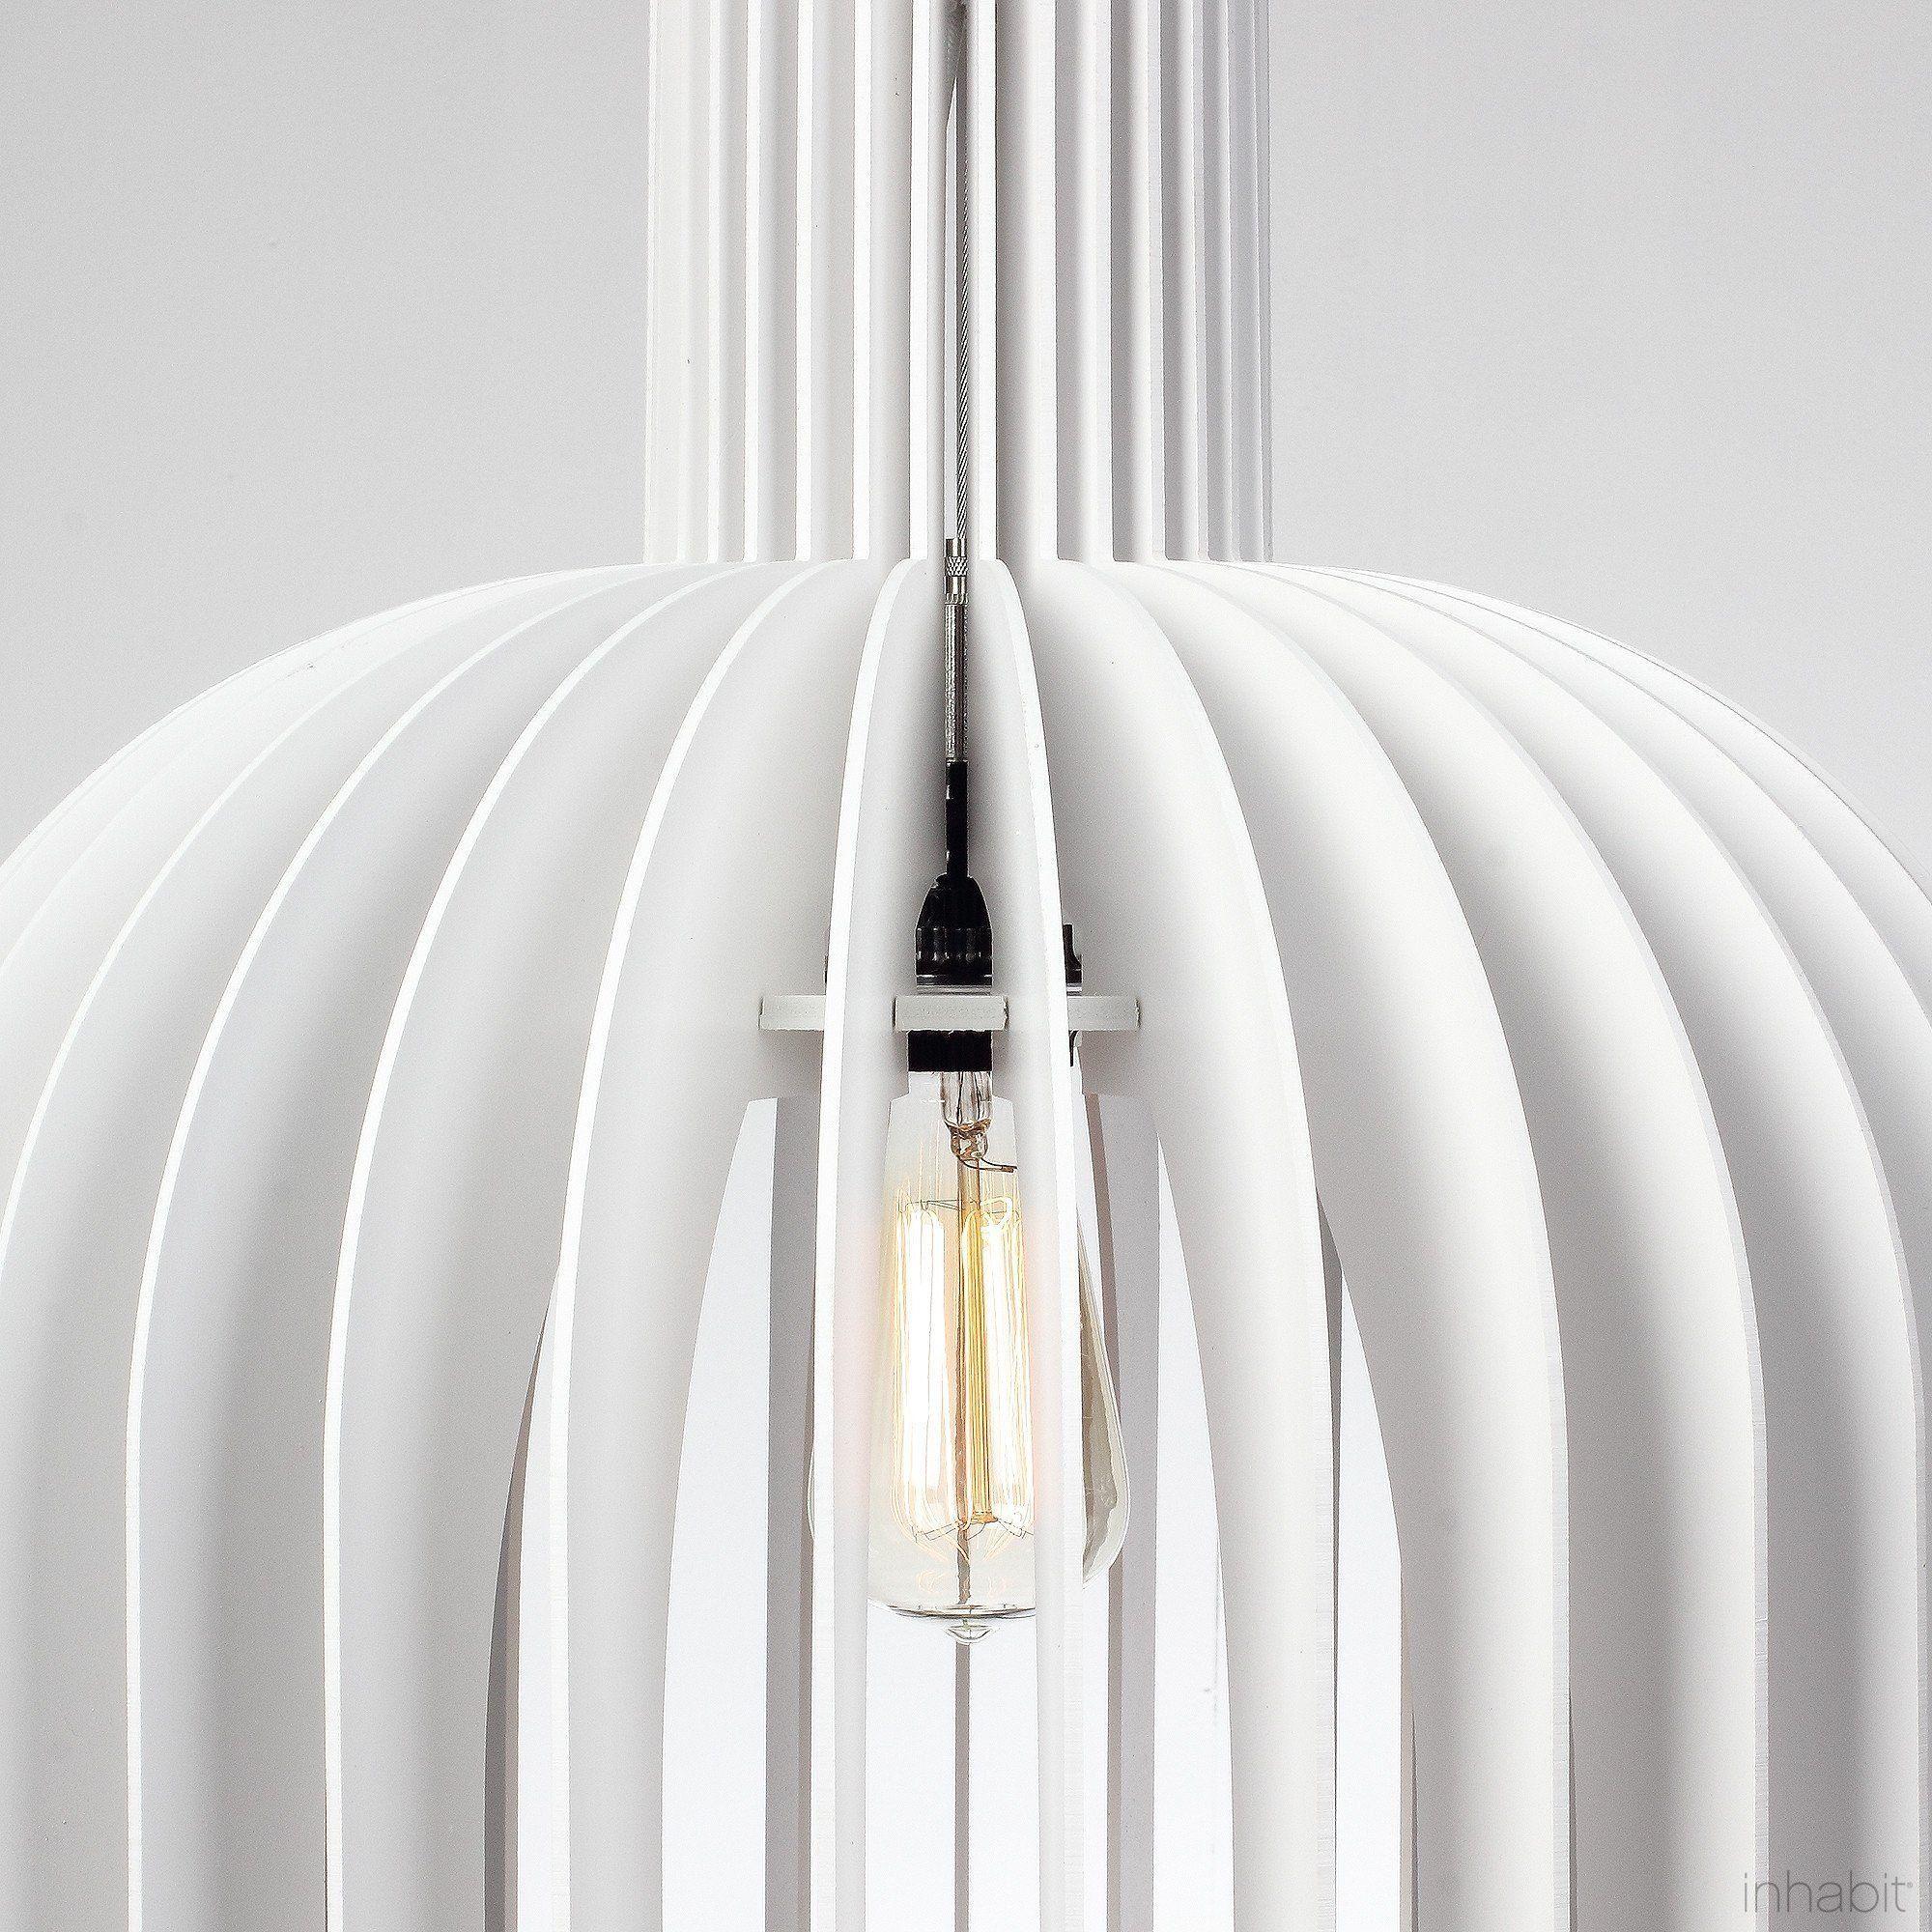 Amien white sculptural pendant light diy canopy canopy